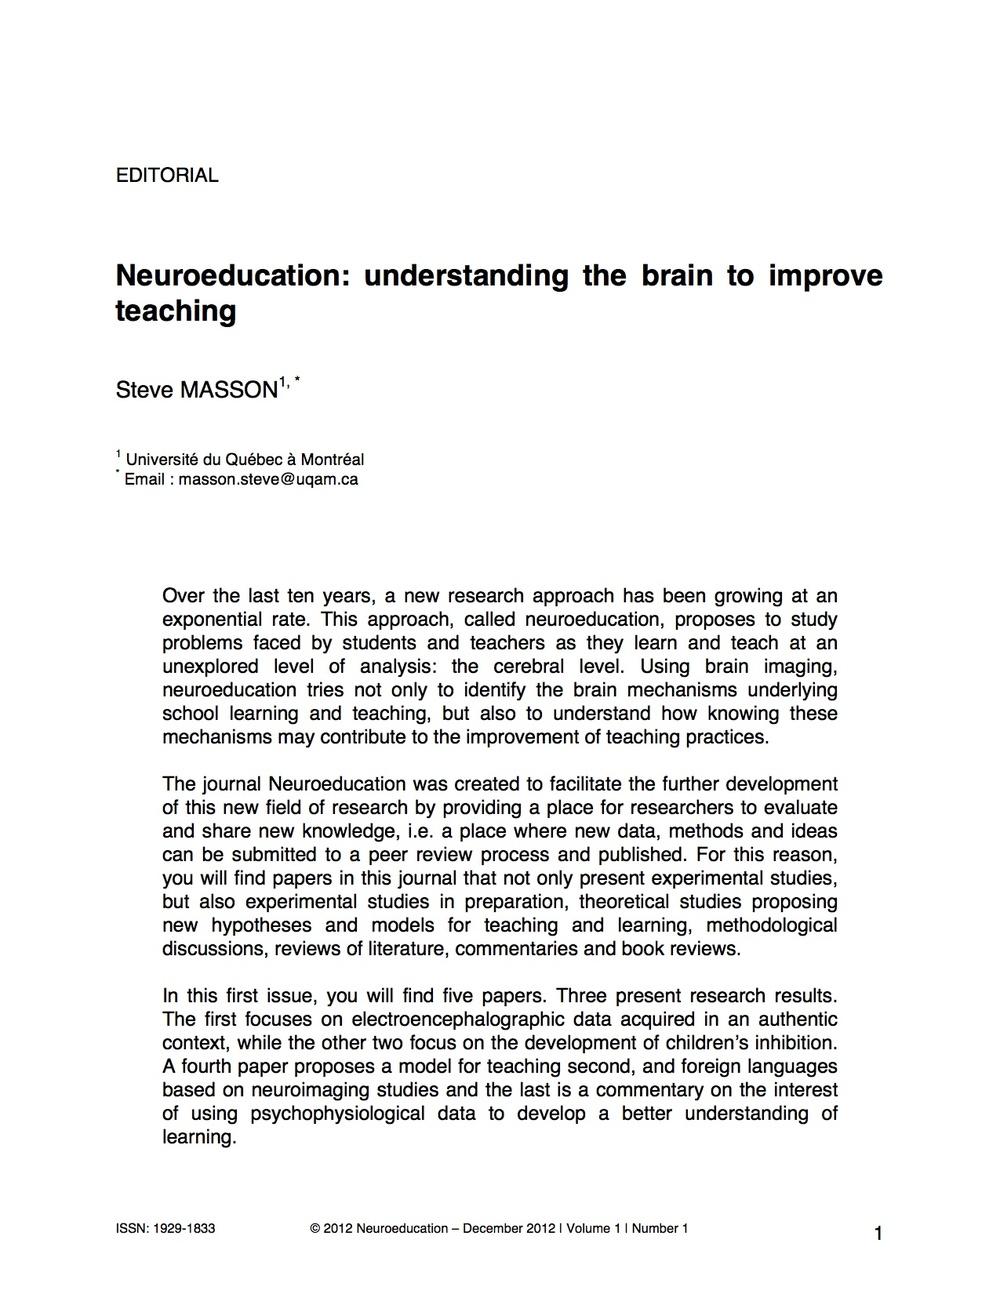 Neuroeducation: Understanding the brain to improve teaching